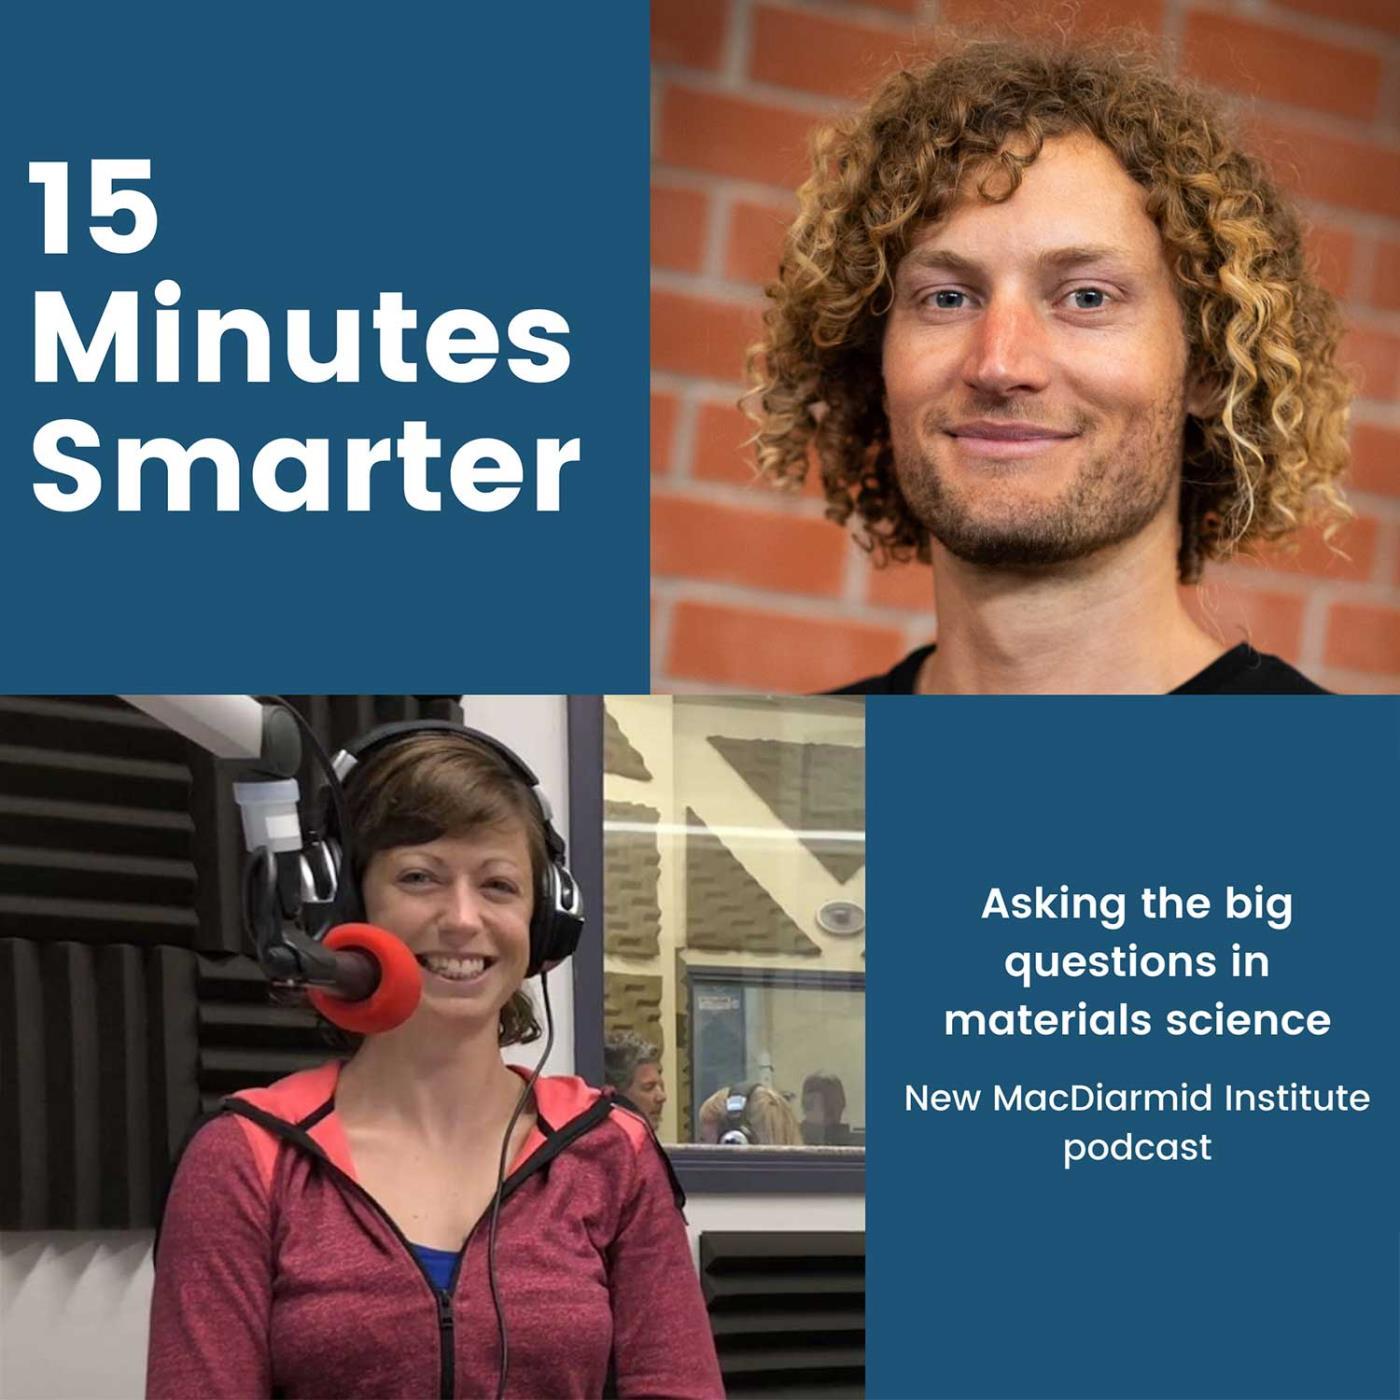 15 Minutes Smarter